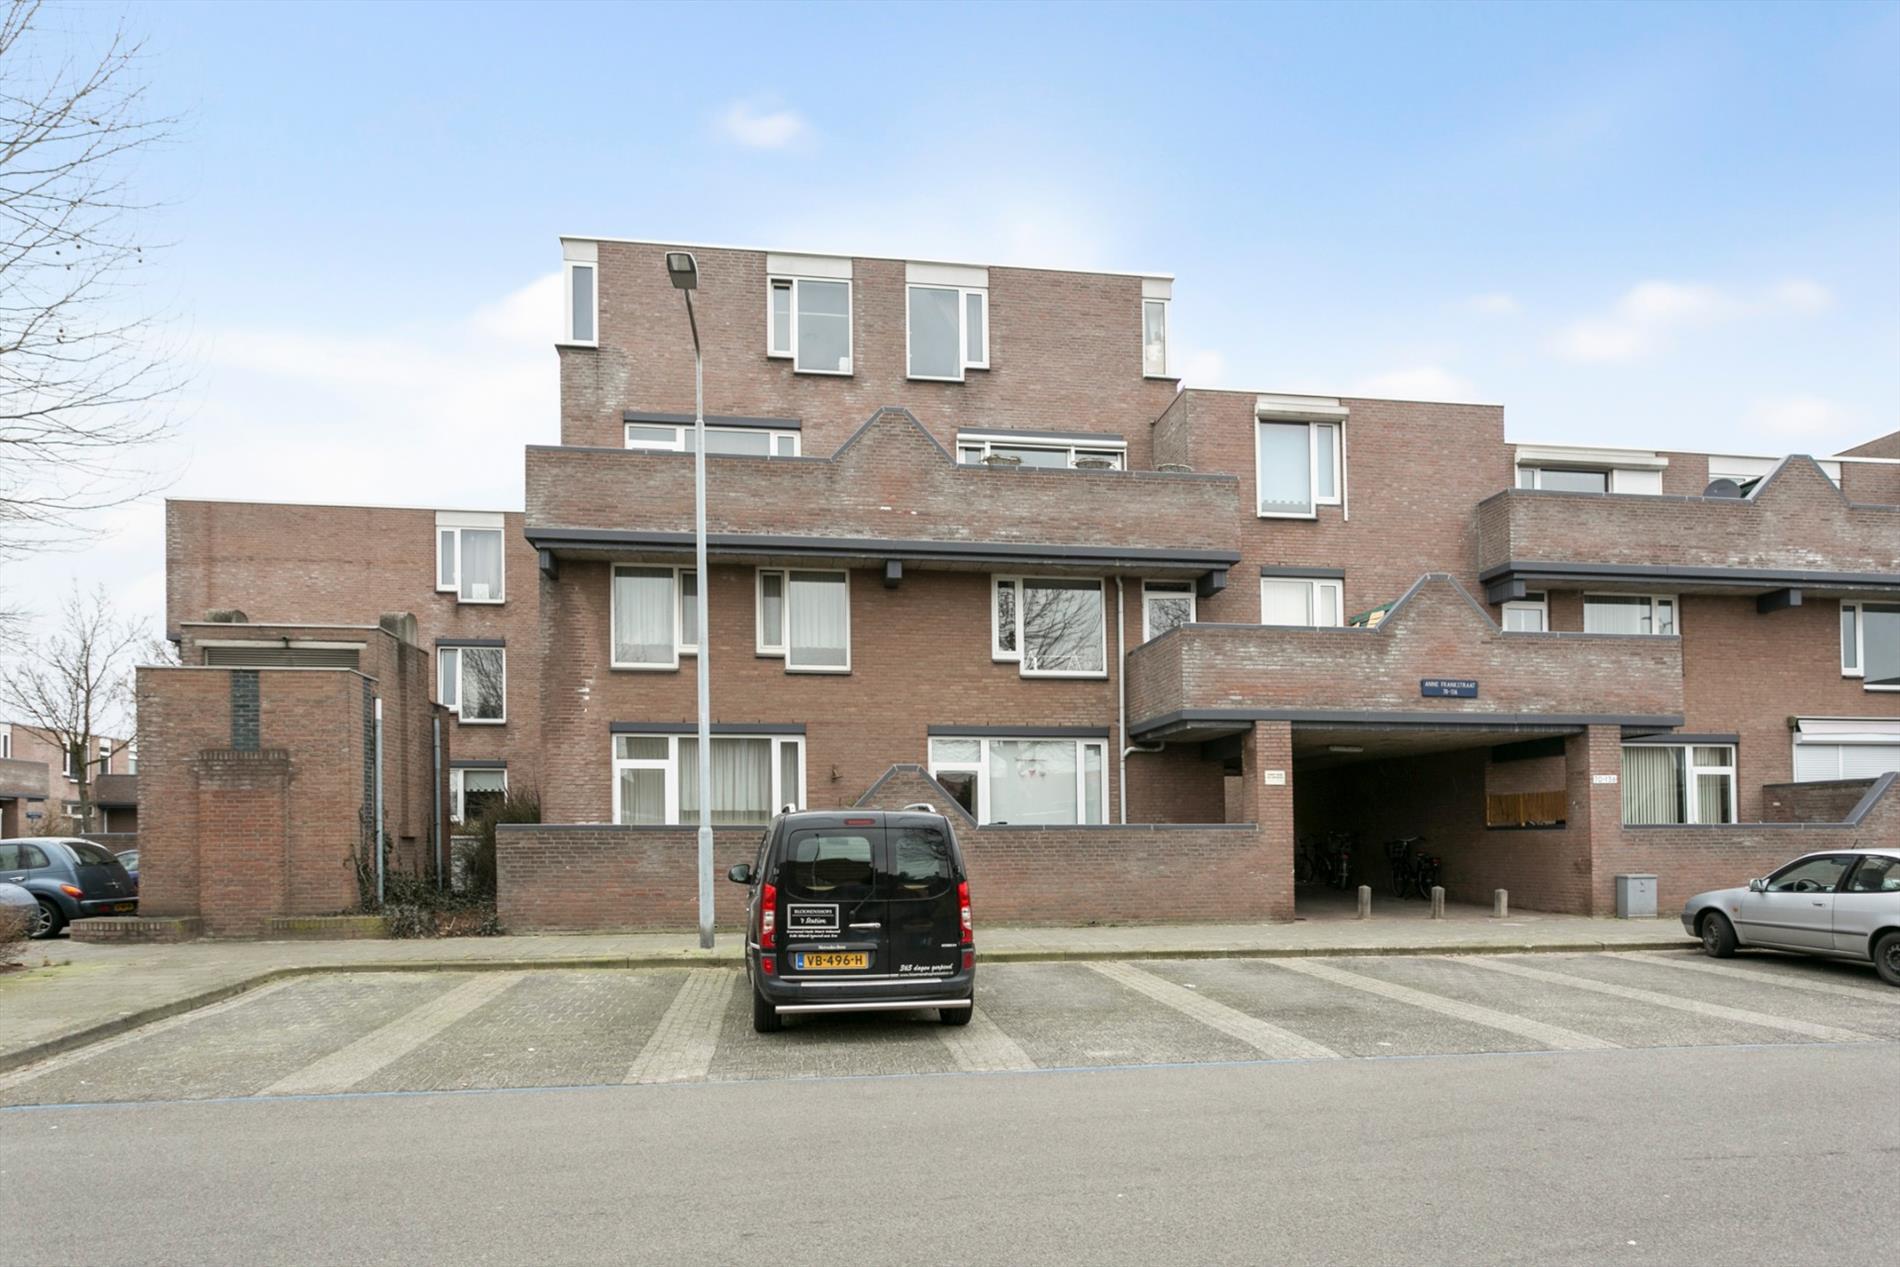 Anne Frankstraat, Venlo